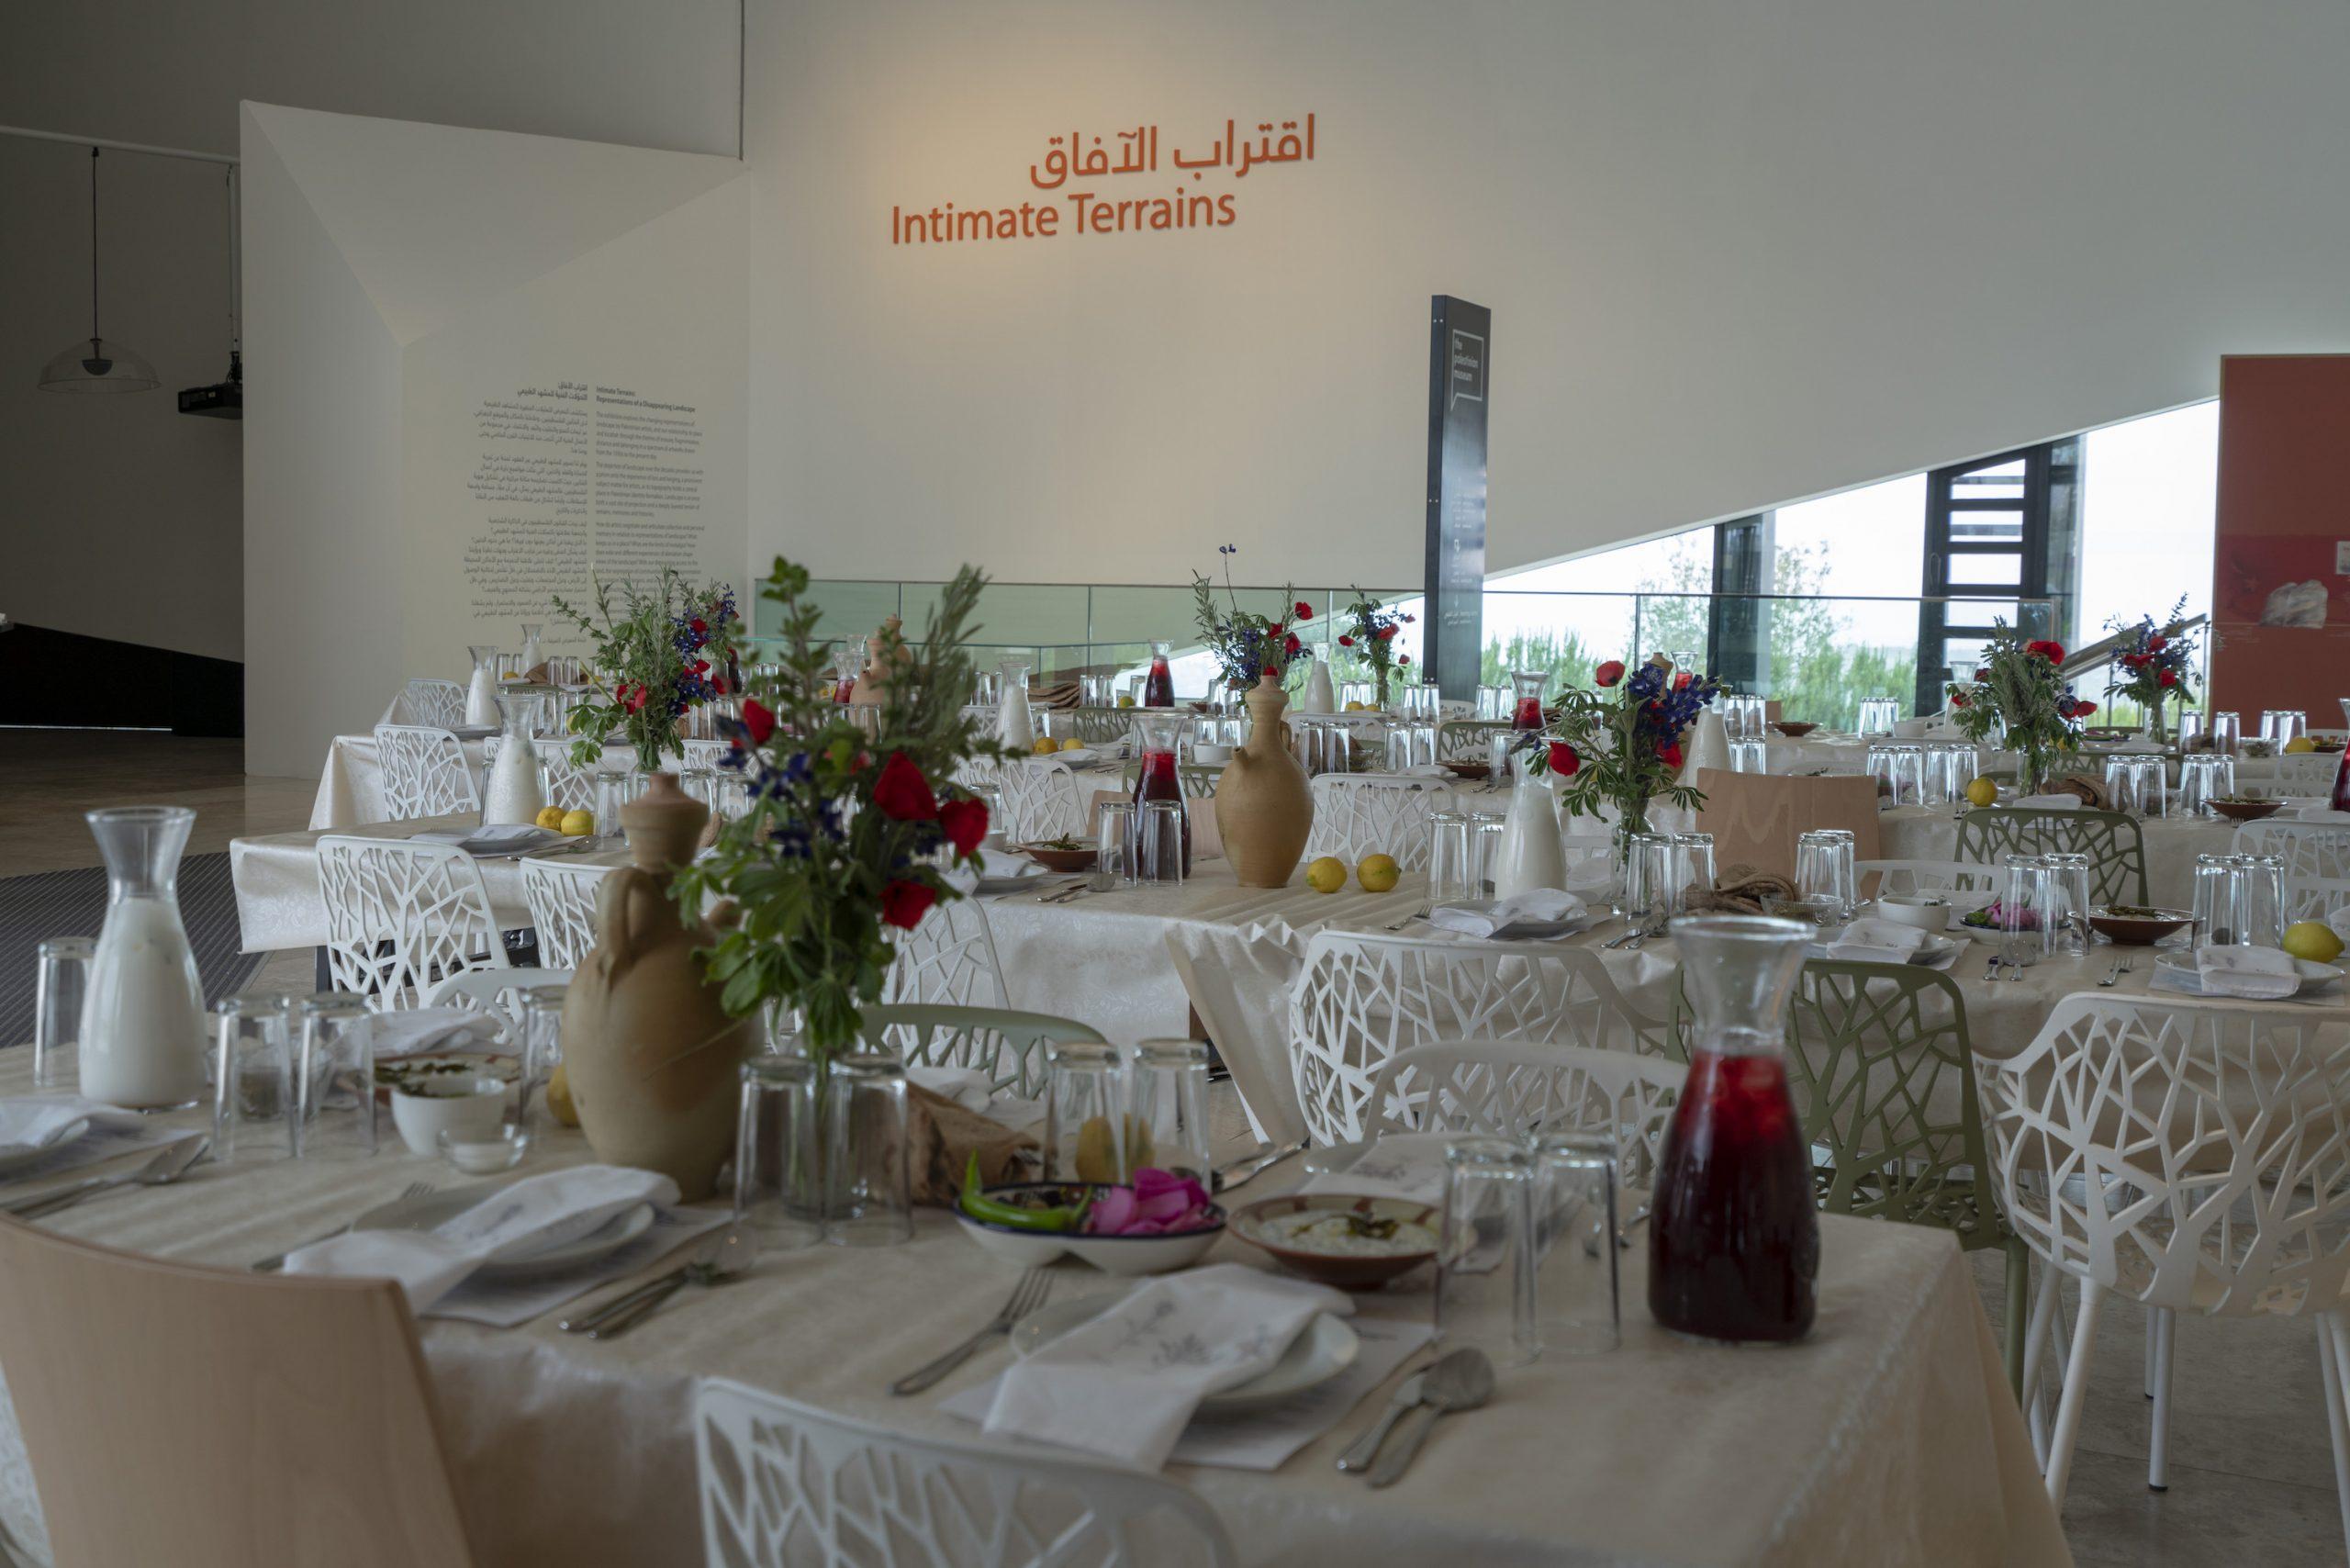 Wild Edible Plants Tablem Palestinian Museum, Birzeit, 2019